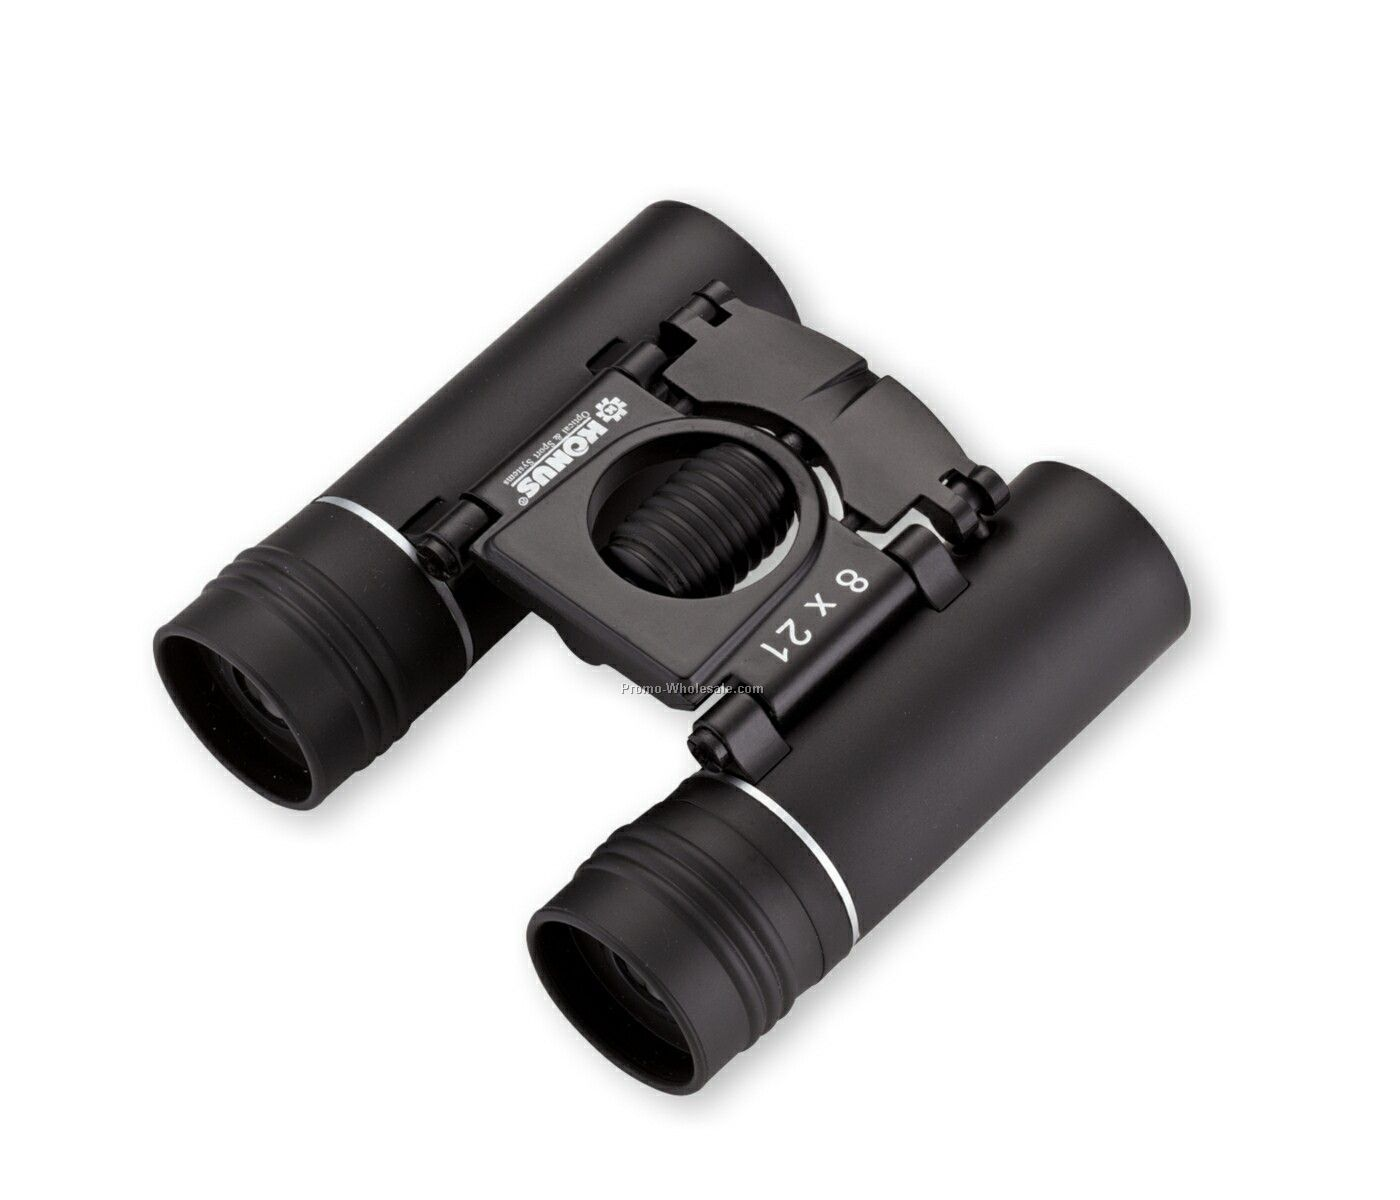 Binolux Compact Zoom Binocular Blue White Wholesale China